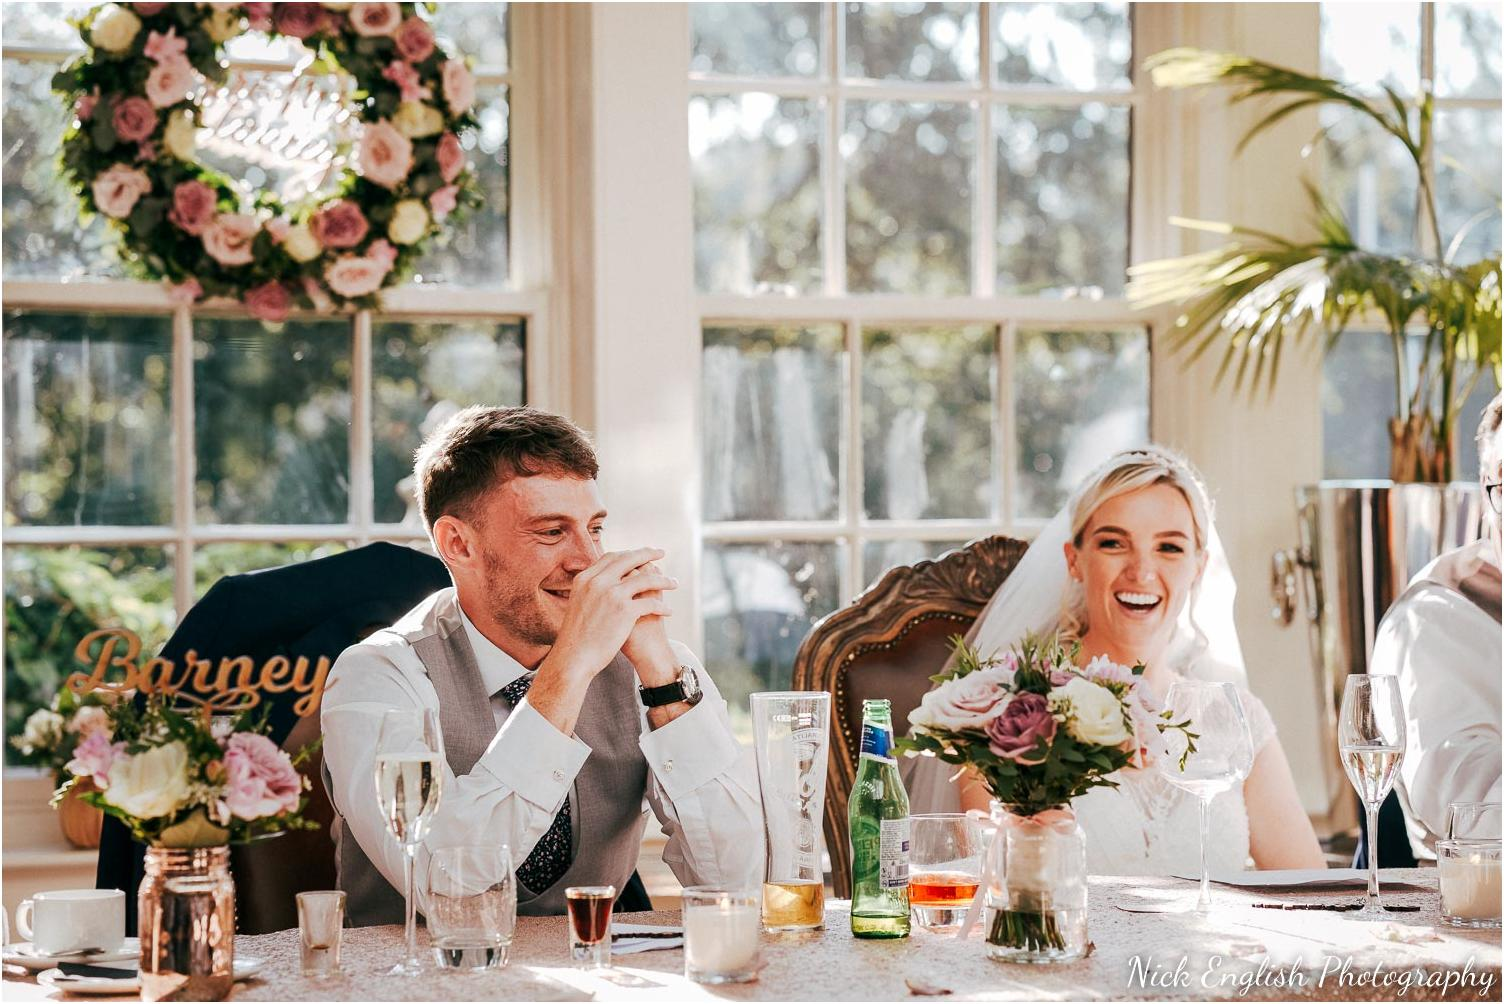 Mitton_Hall_Wedding_Photograph-155.jpg